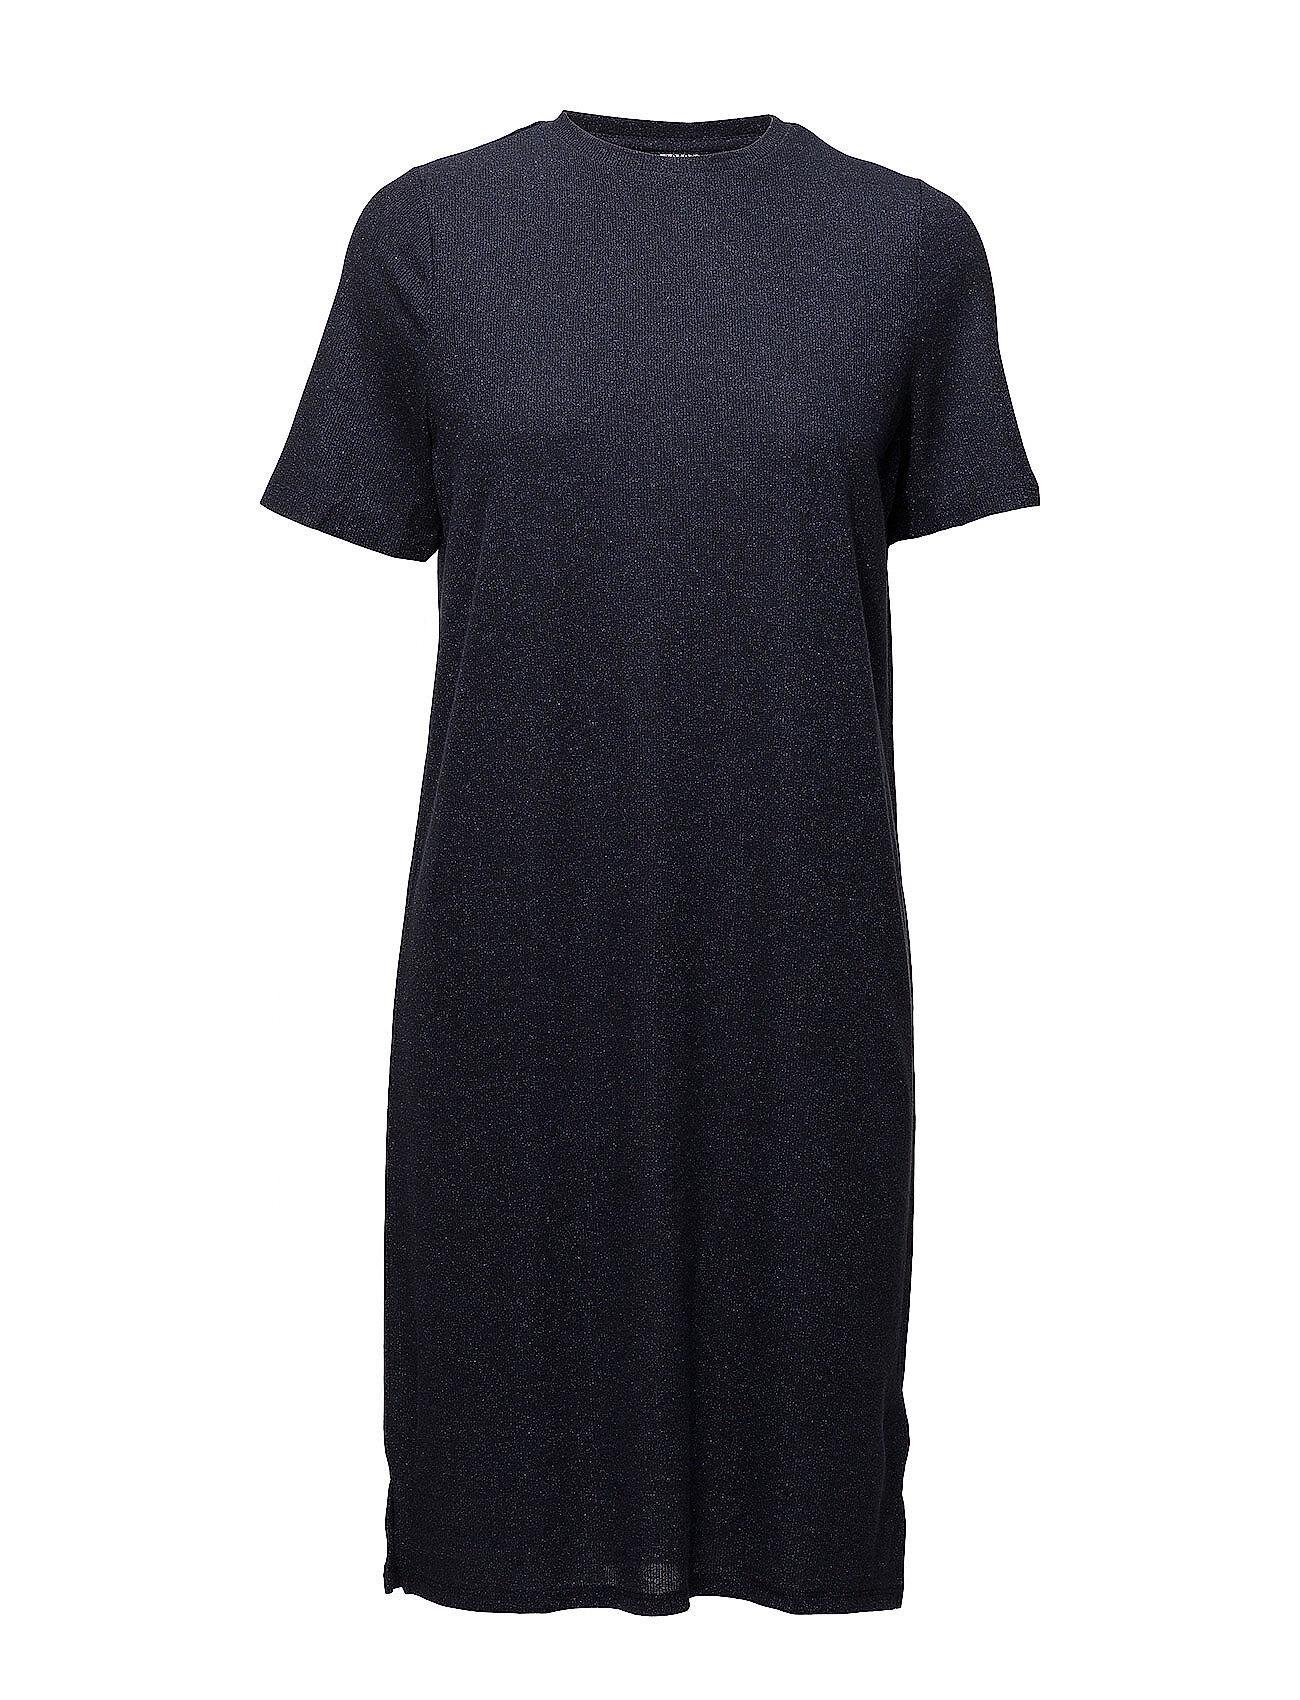 Saint Tropez Shimmer Knit Dress W. Slits Lyhyt Mekko Sininen Saint Tropez